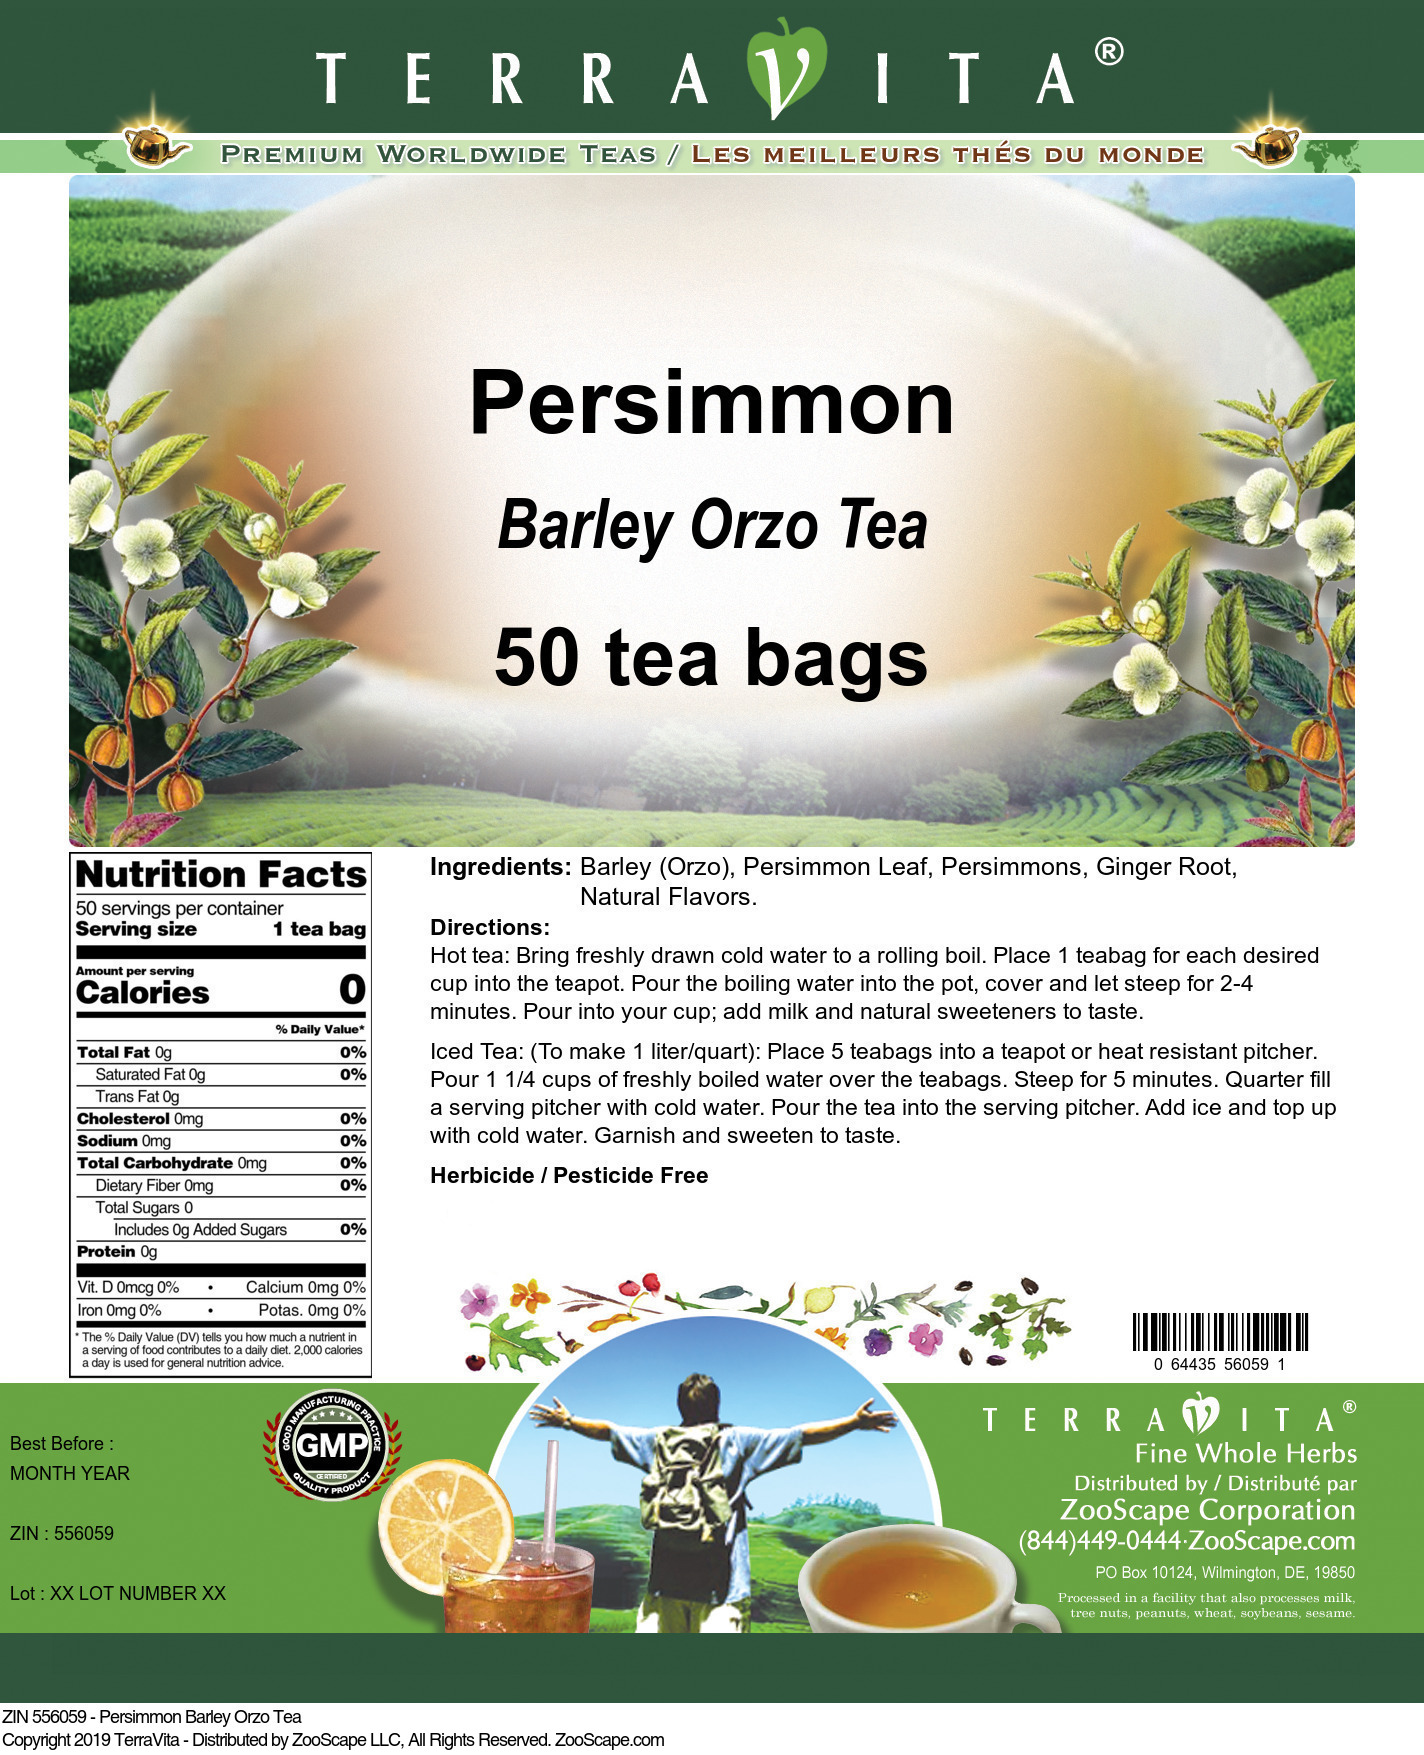 Persimmon Barley Orzo